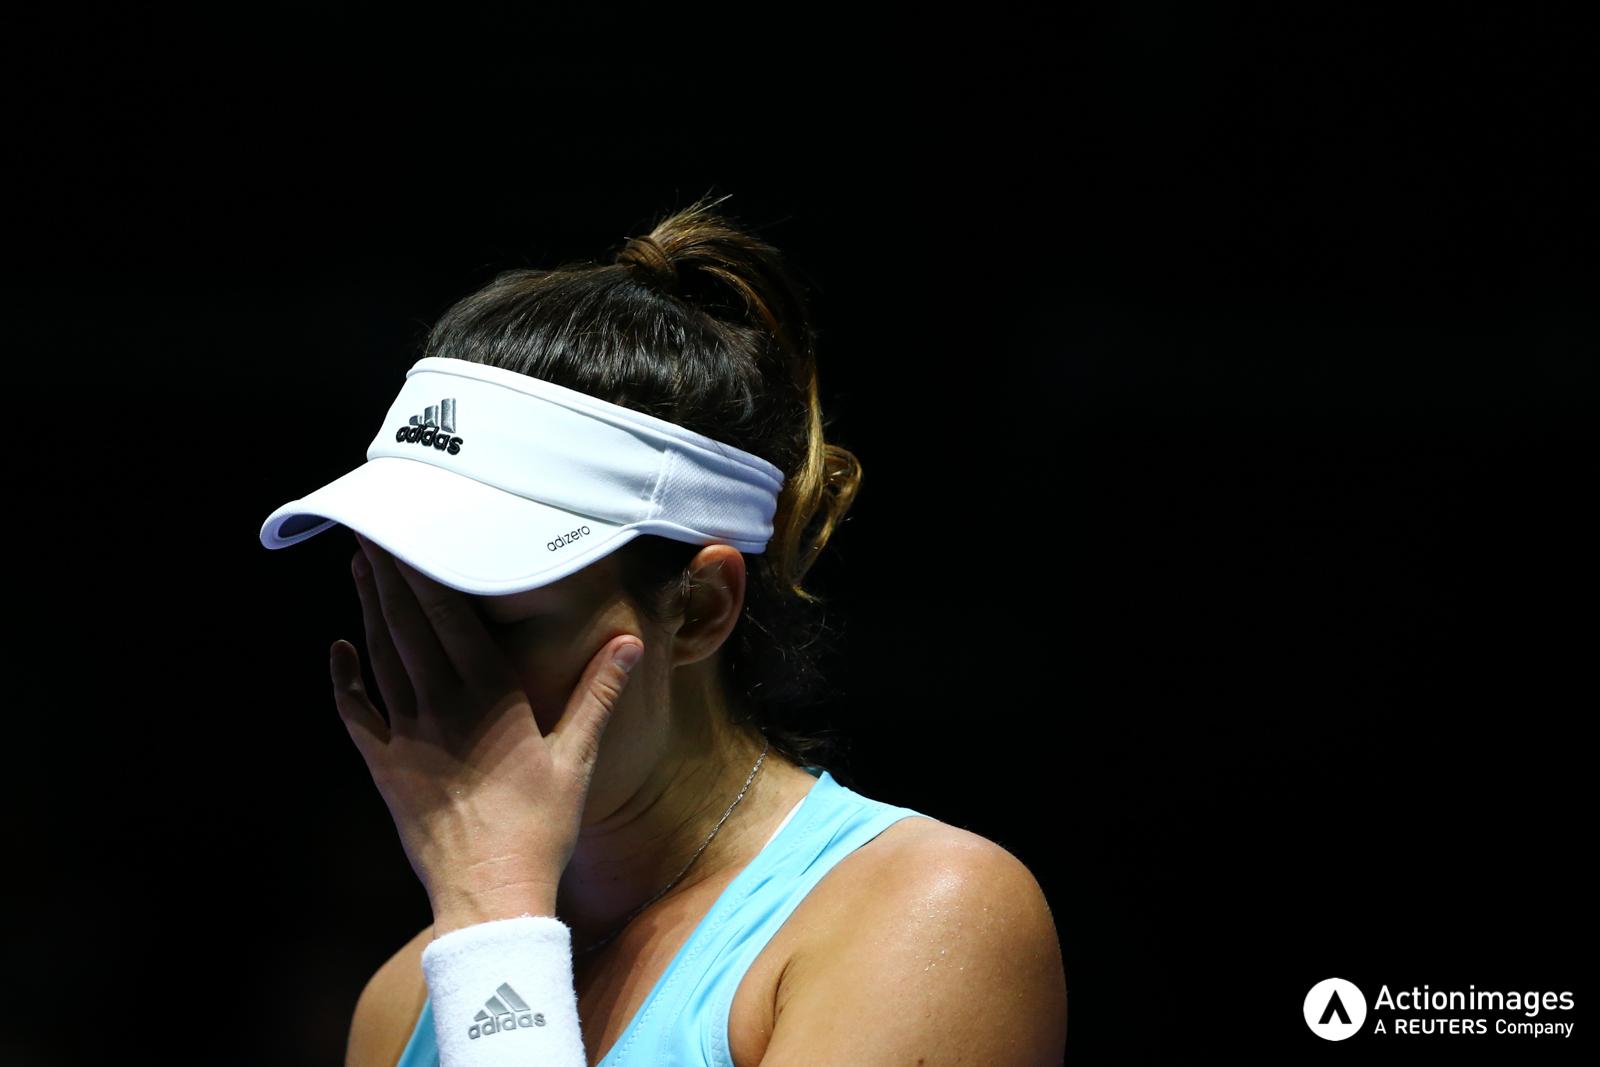 Tennis - BNP Paribas WTA Finals - Singapore Indoor Stadium - 25/10/16 Spain's Garbine Muguruza reacts during her round robin match Mandatory Credit: Action Images / Yong Teck Lim Livepic